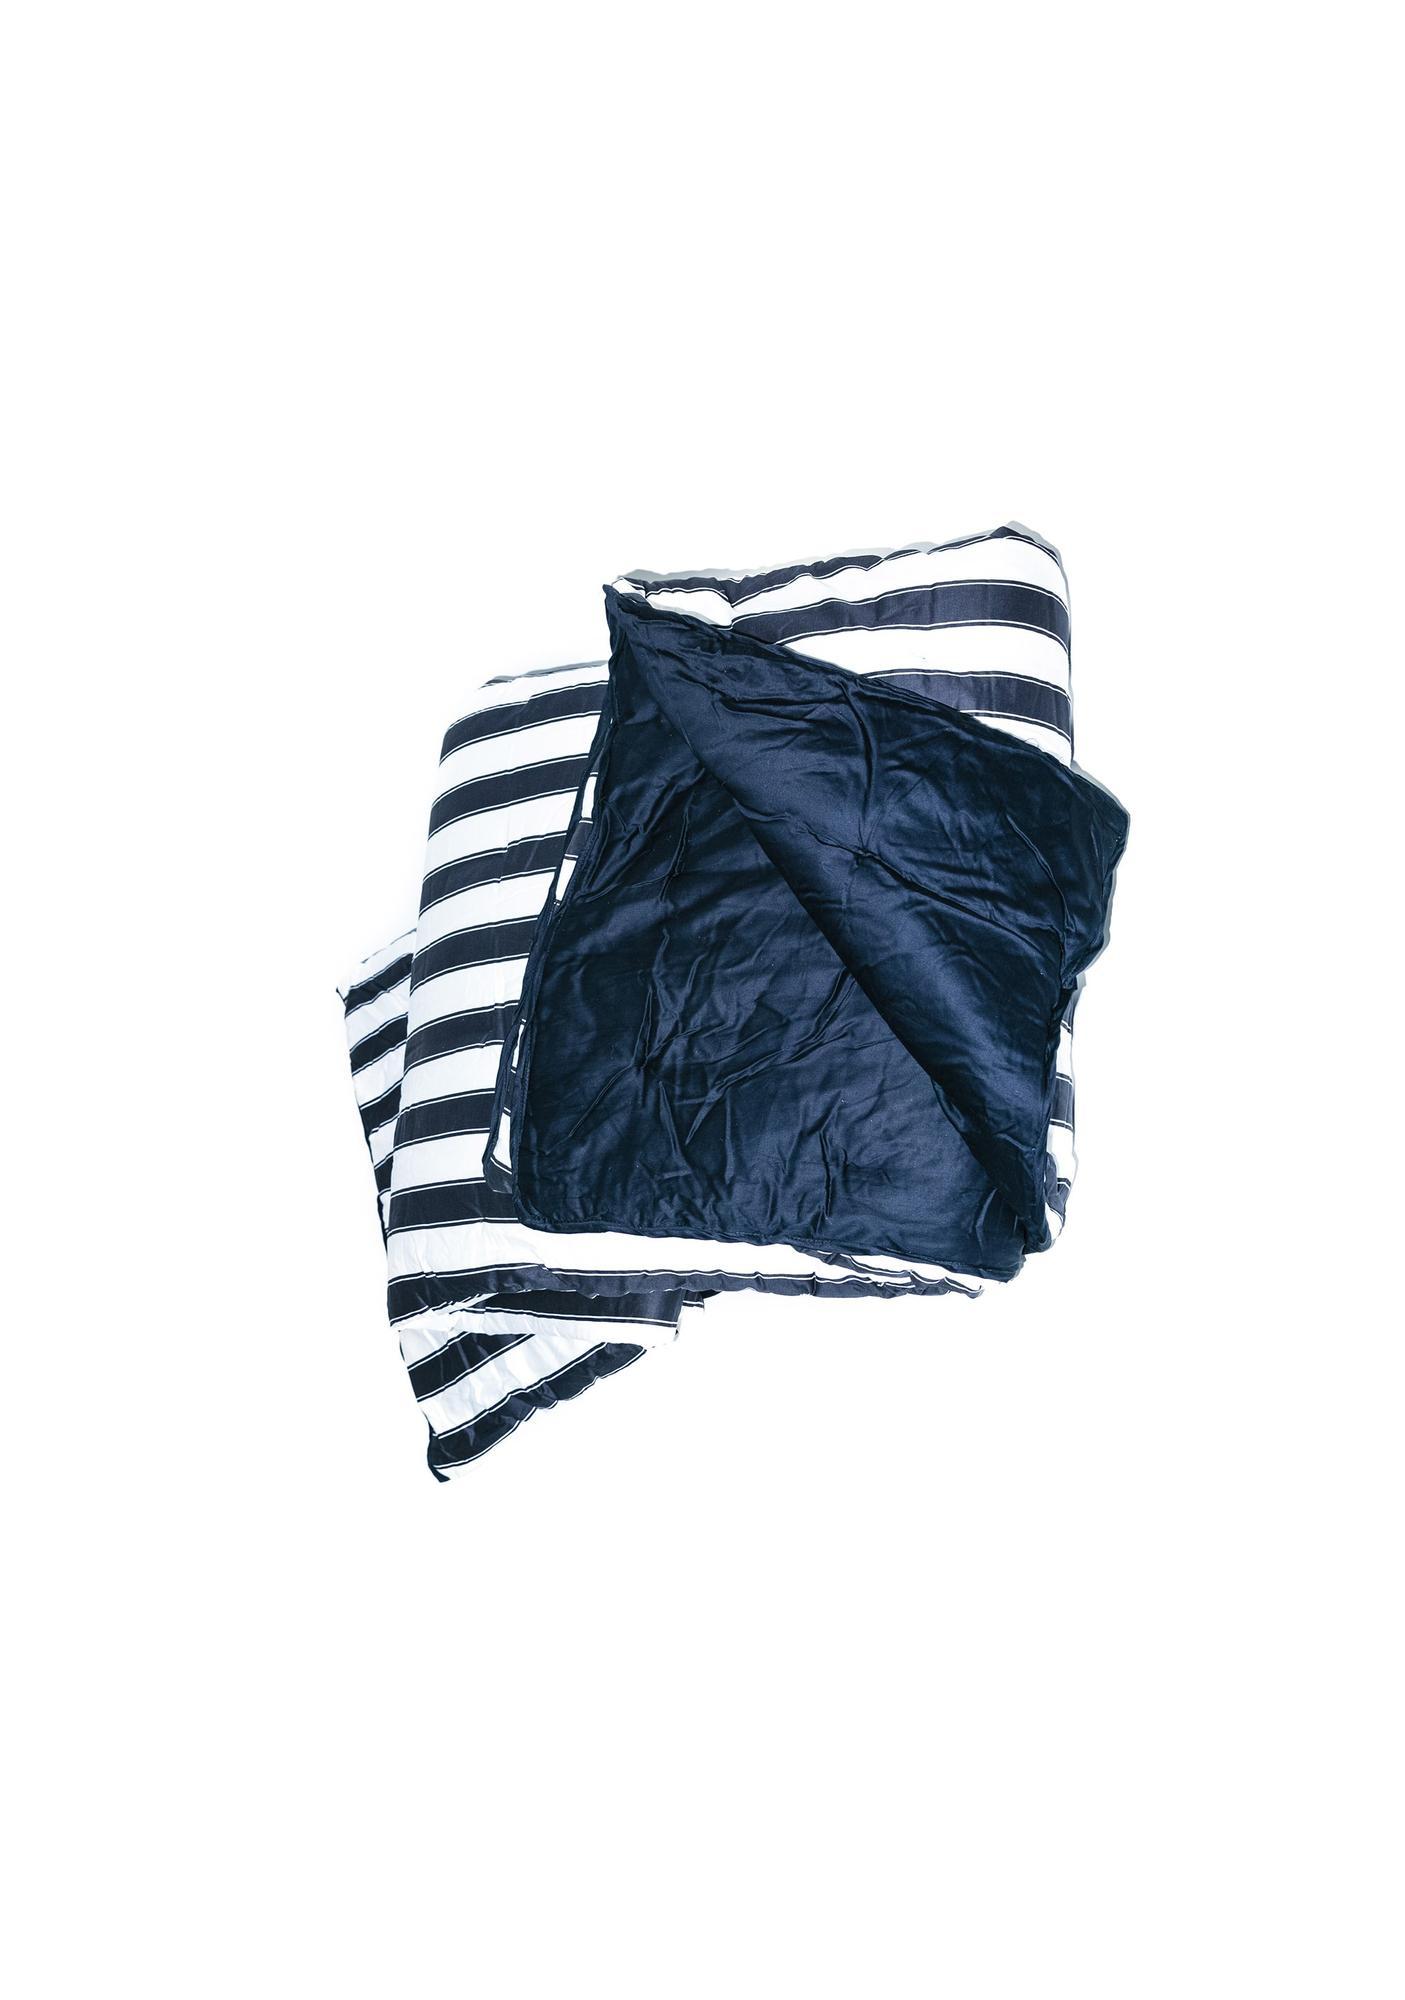 Beetlejuice Comforter